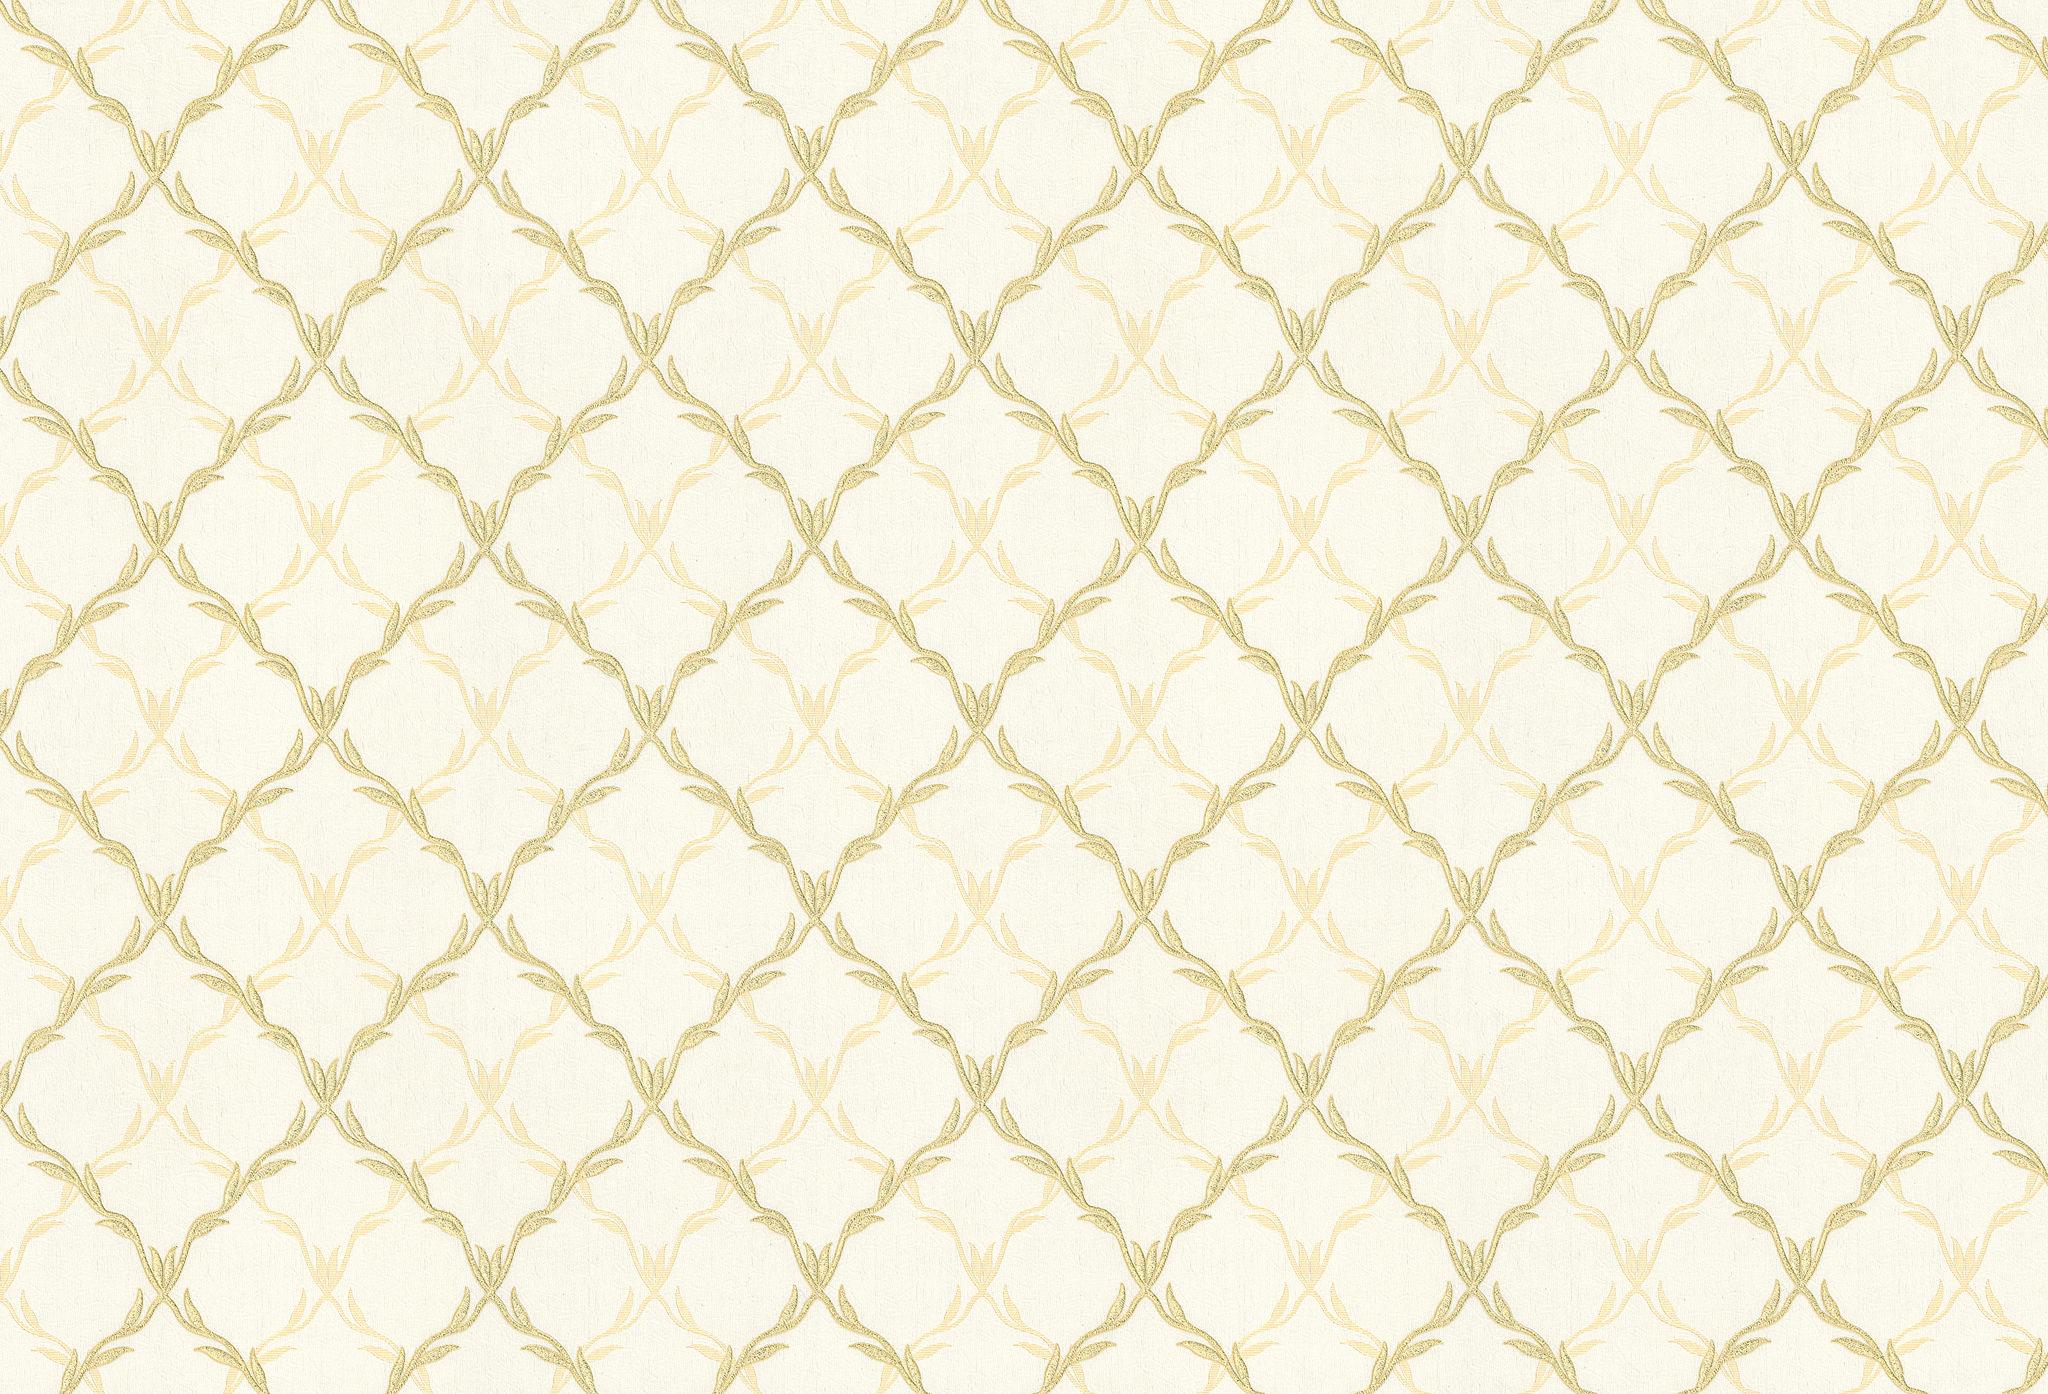 Wallcovering_(넝쿨다마스크) ZN025-1